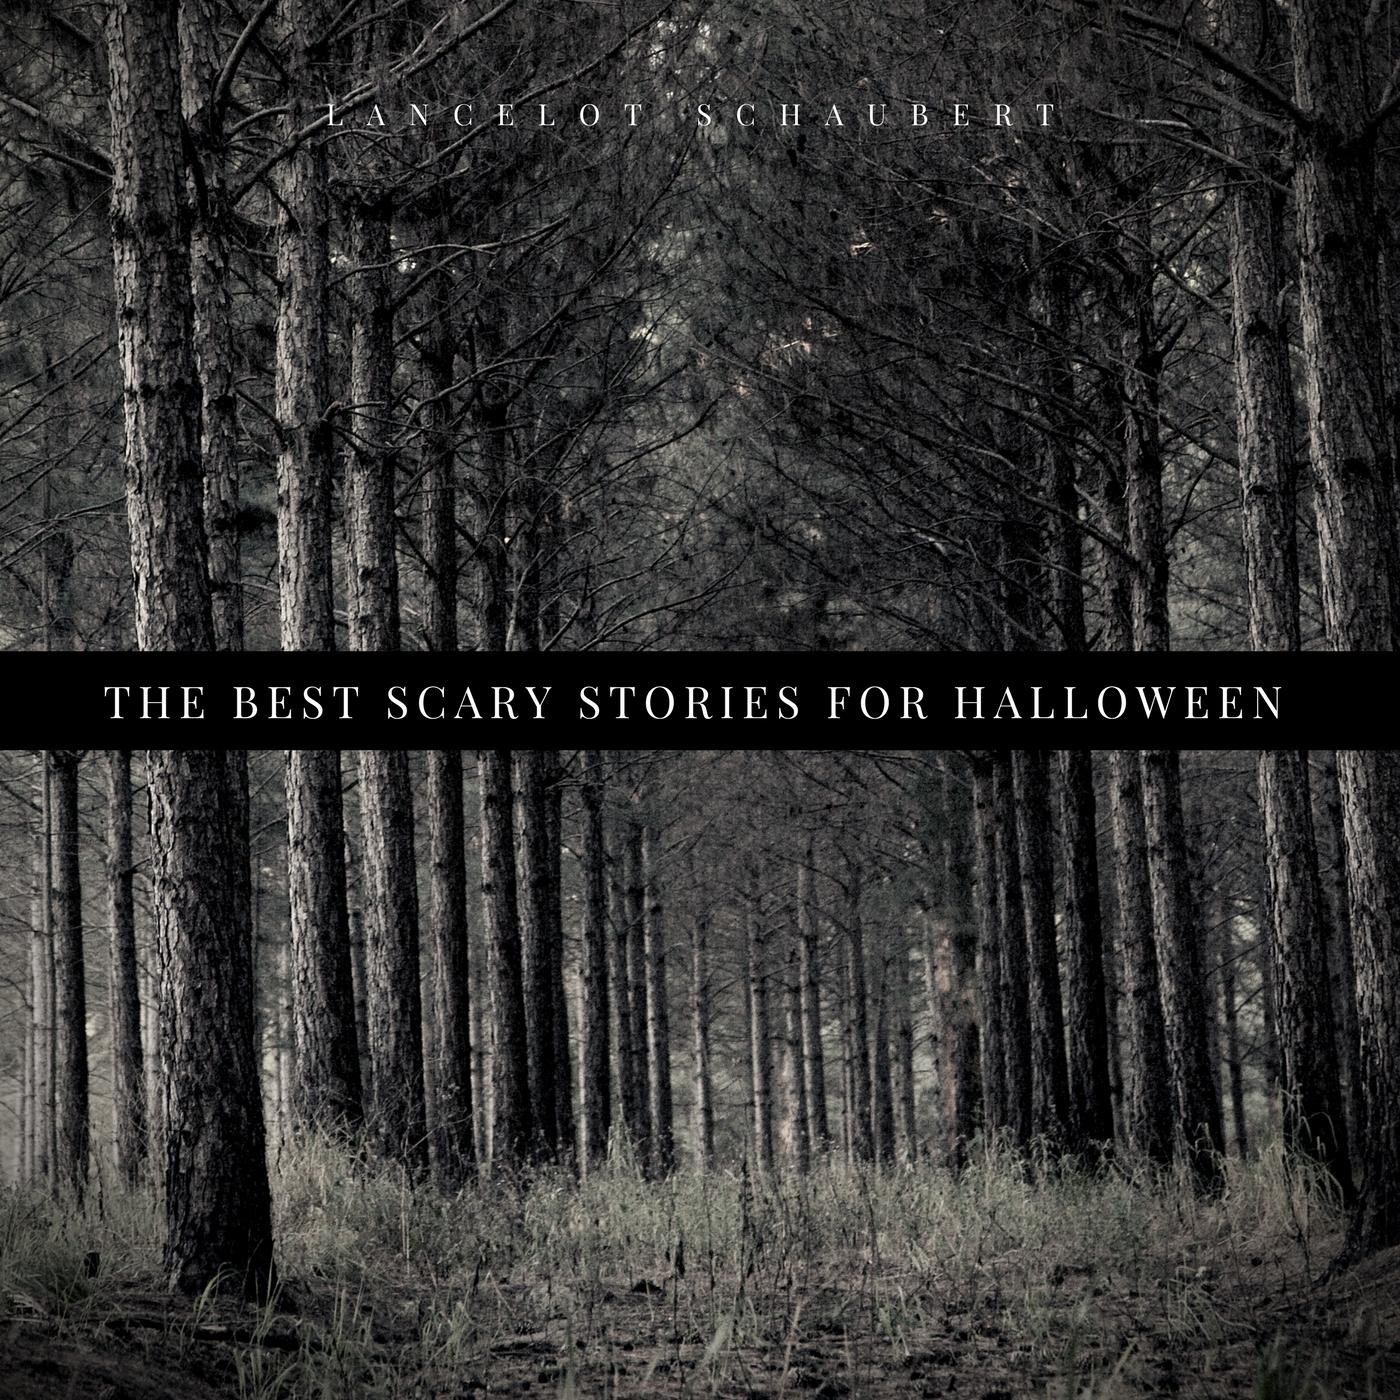 The Best Scary Stories for Halloween – Lancelot Schaubert   Listen